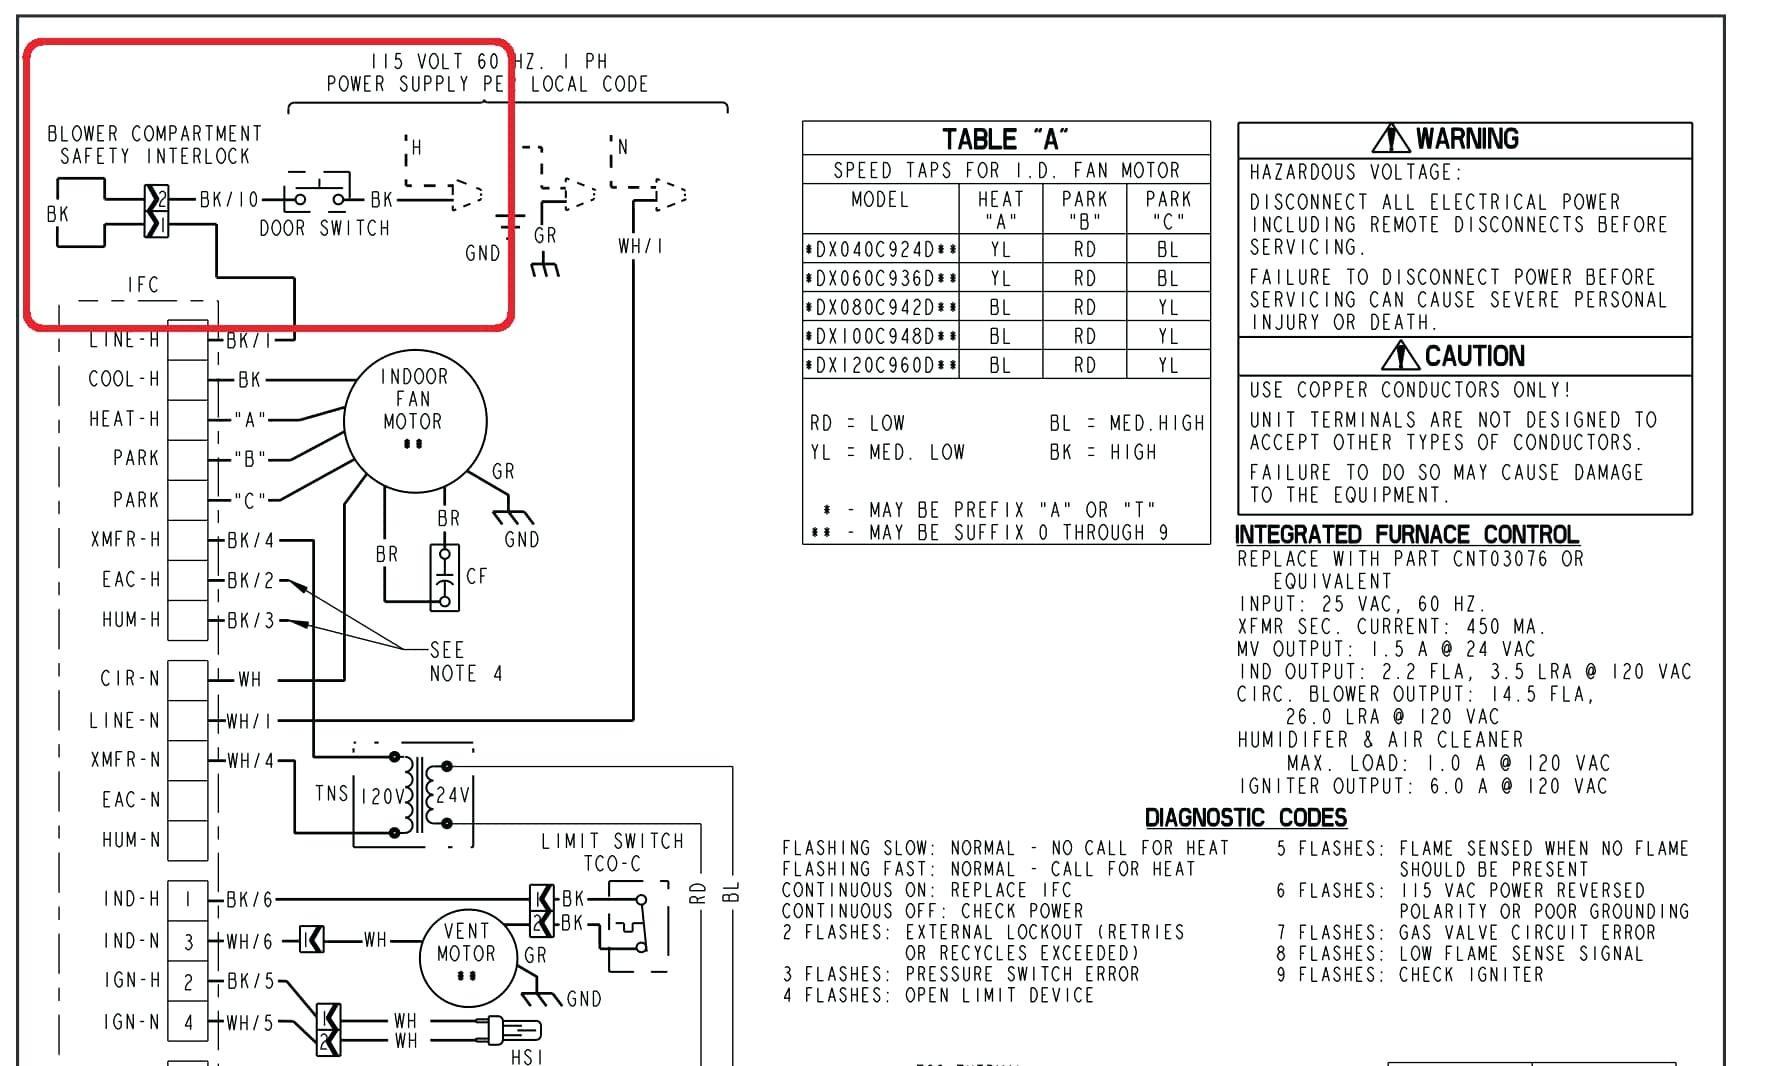 John Deere Wiring Diagram Lt155